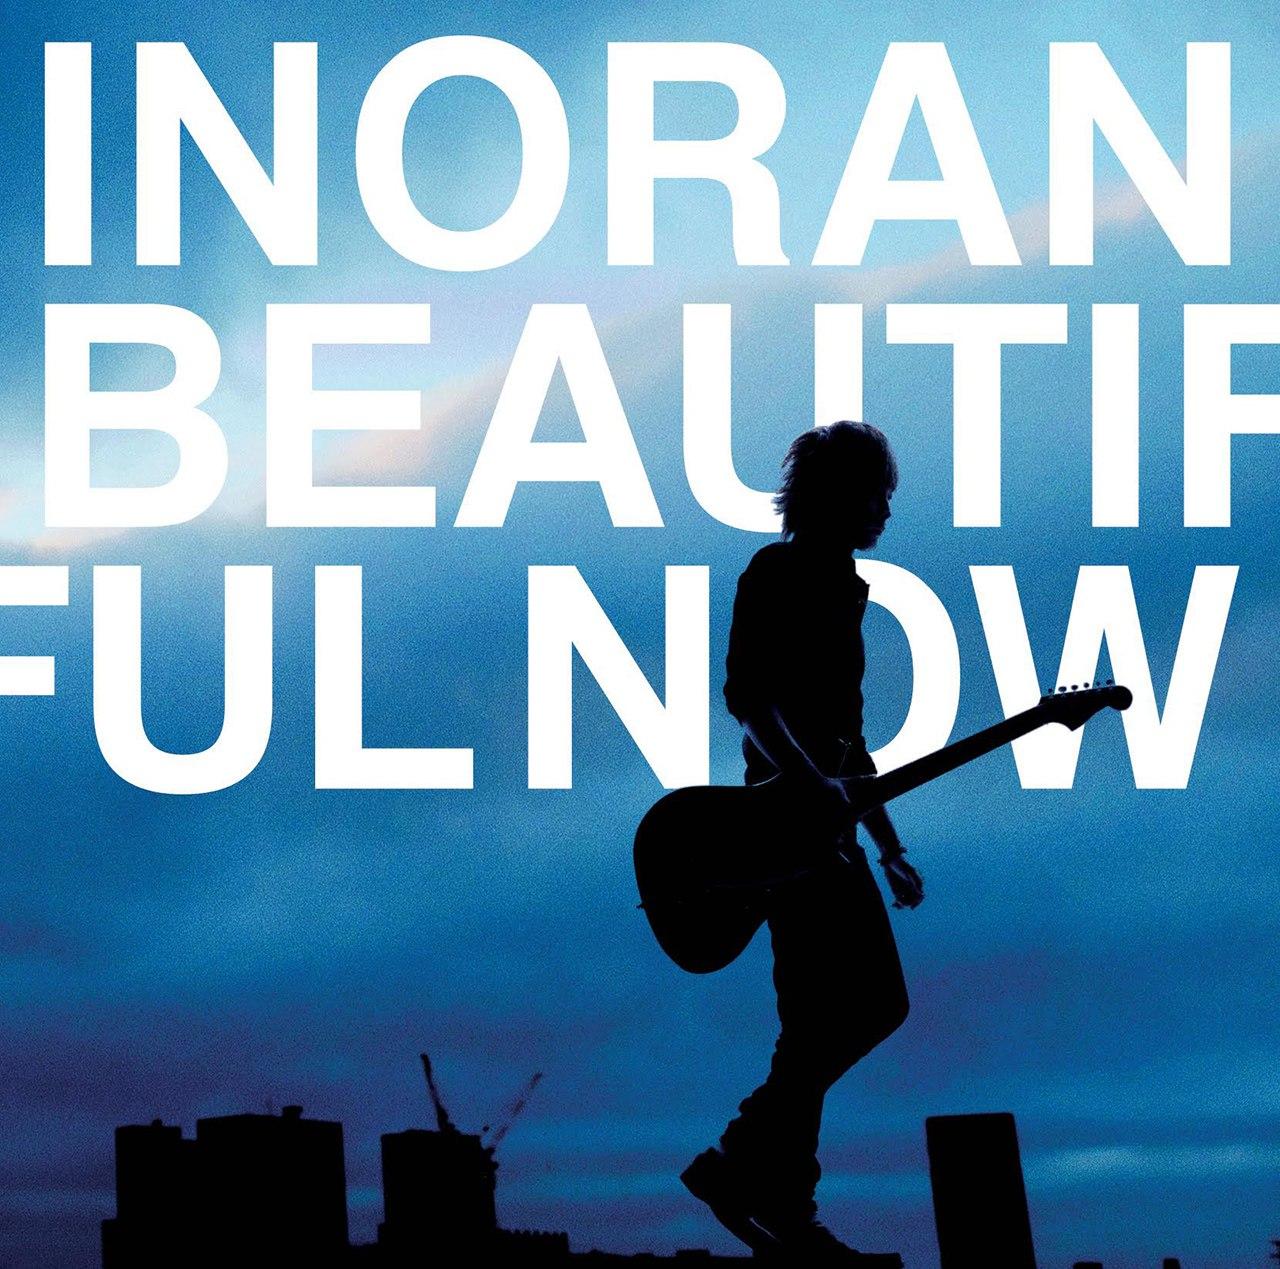 альбом года азия 2015 Inoran - Beautiful Now